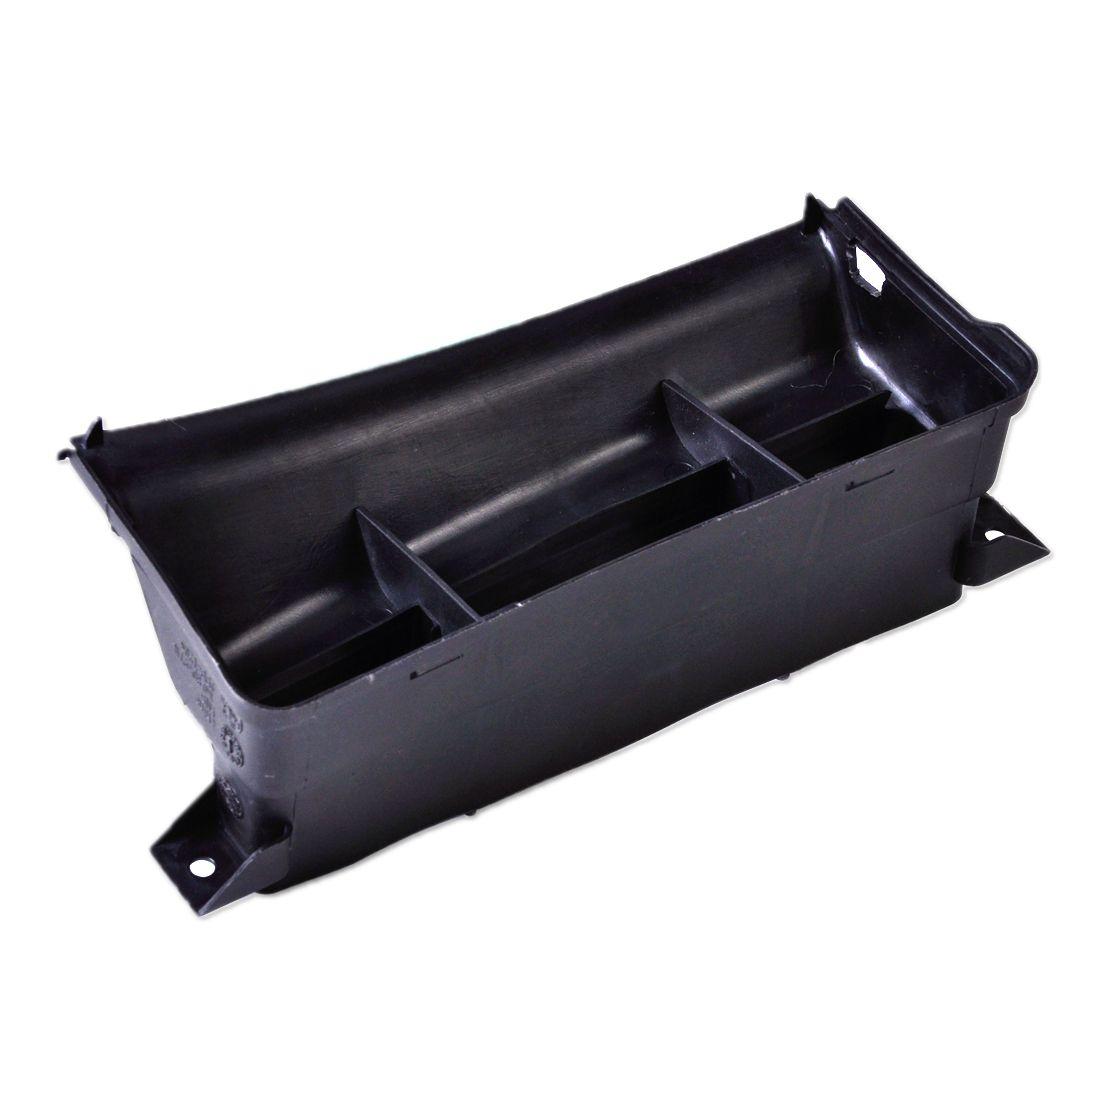 New 1Pc Black Air Intake Guide Inlet Duct 1K0805971C 1K0805971 Fit for VW Volkswagen Golf Mk6 Jetta Mk5 Mk6 2011 2012 2013